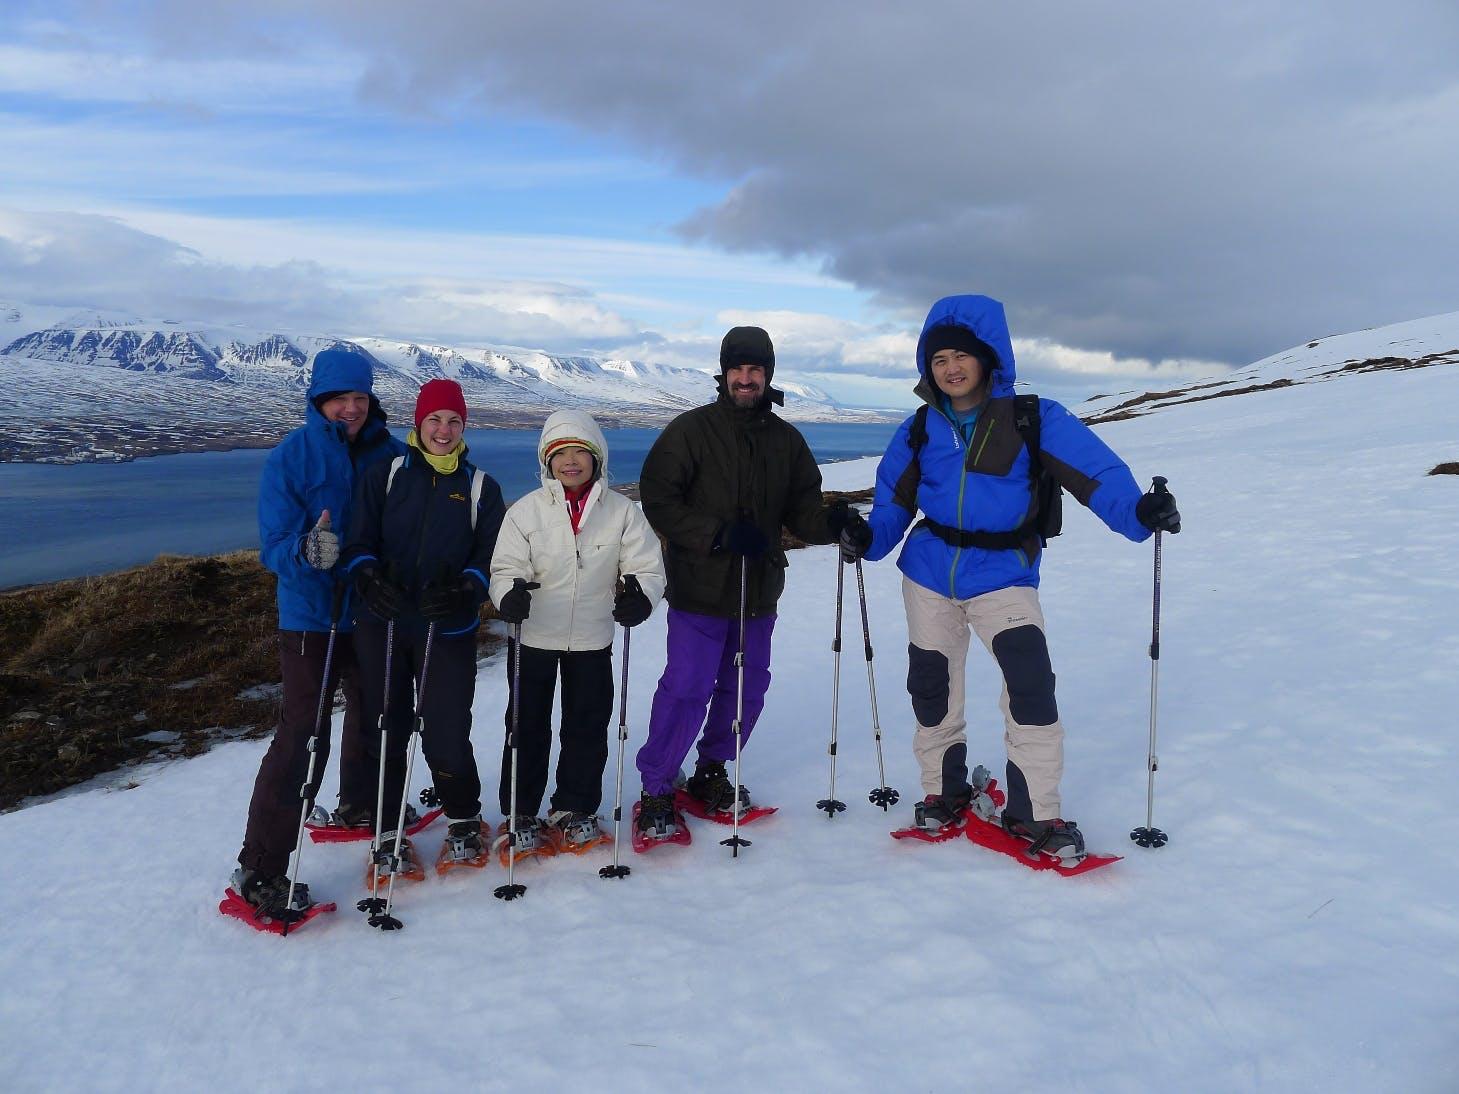 Snowshoe through the beautiful Icelandic nature.